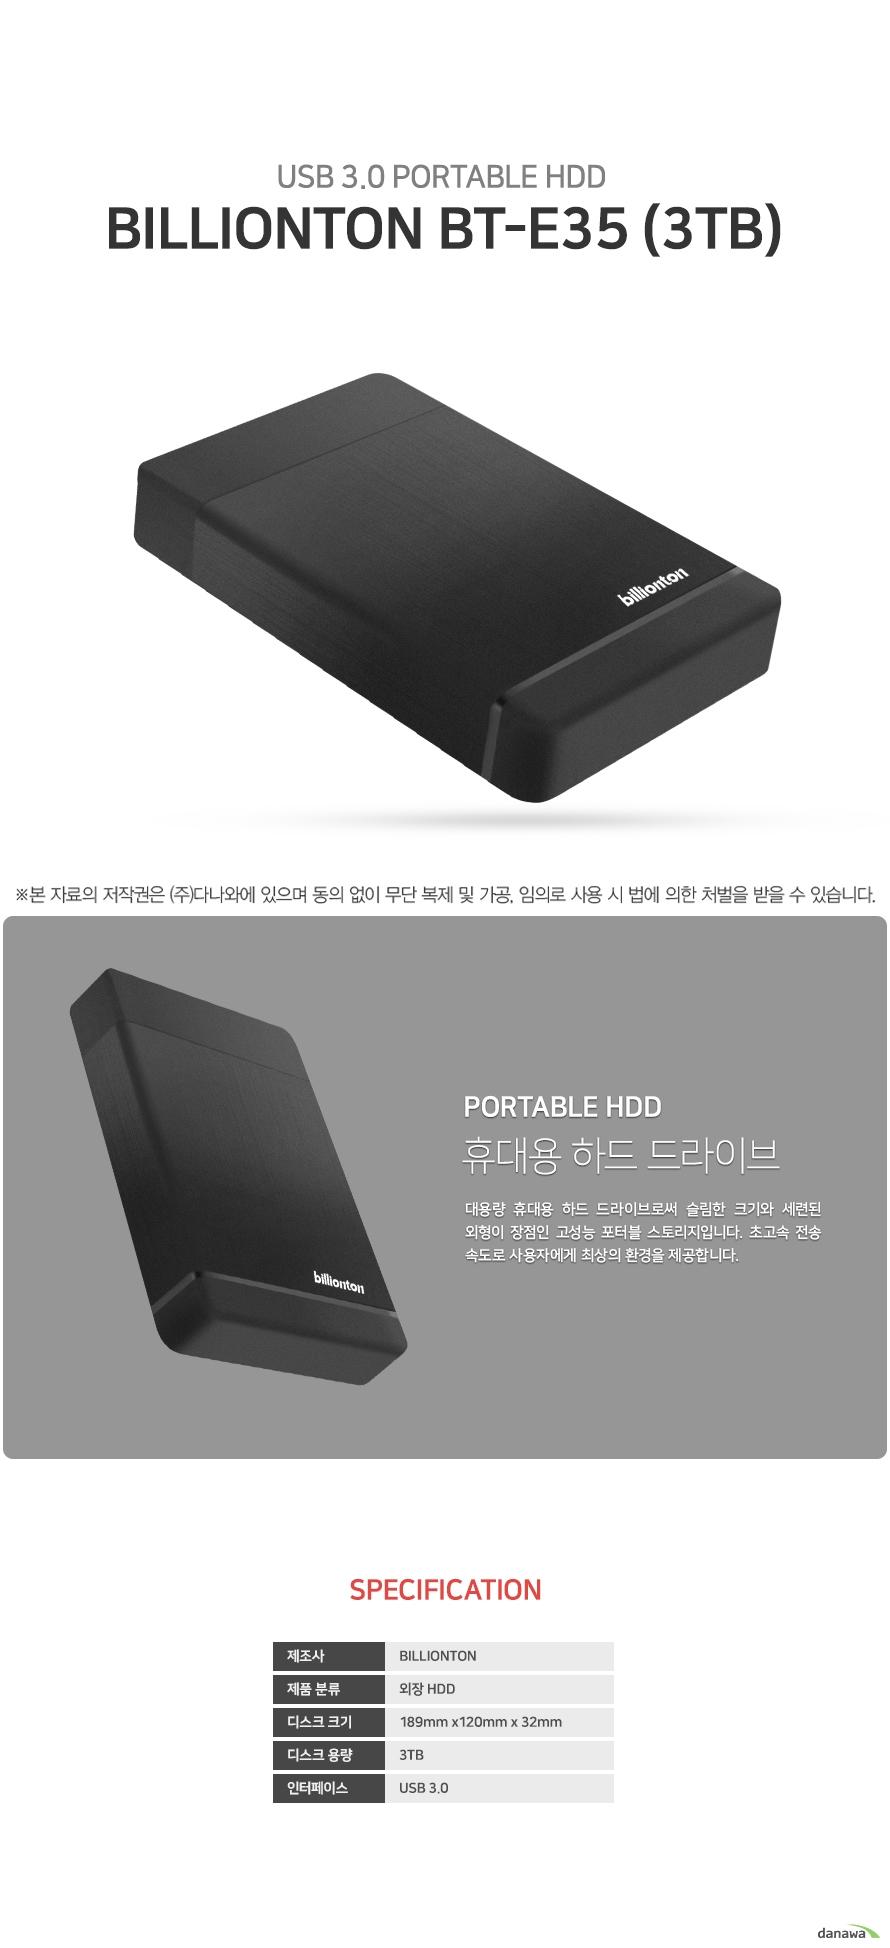 Billionton BT-E35 (3TB)  상세정보  제조사 billionton 제품 분류 외장 hdd 디스크 크기 길이 189 밀리미터              넓이 120 밀리미터             두께 32 밀리미터  디스크 용량 3테라바이트 인터페이스 usb 3.0